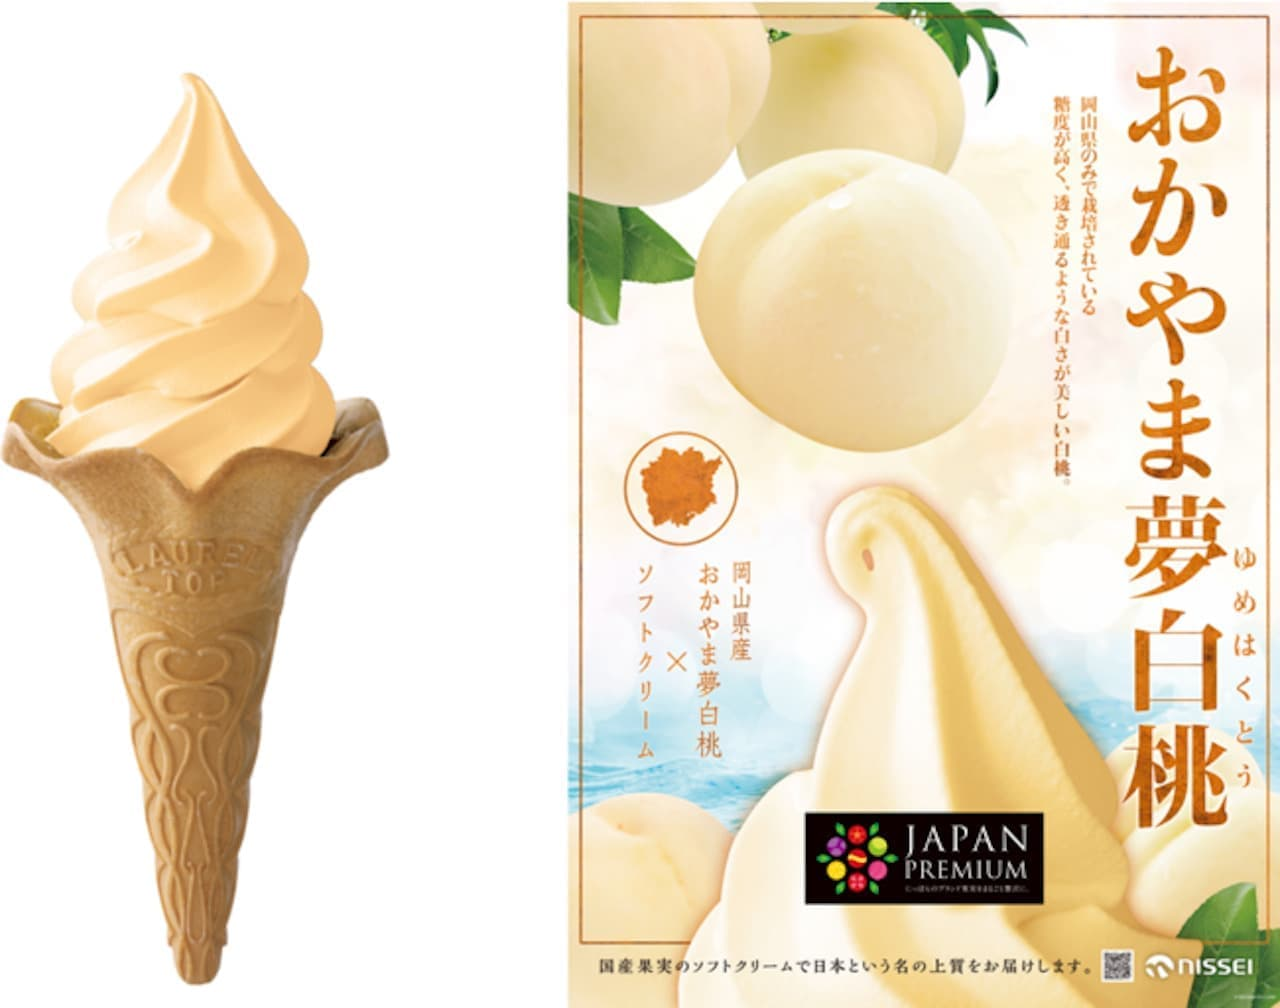 「JPおかやま夢白桃ソフトミックス」希少な白桃「おかやま夢白桃」を使ったソフトクリーム